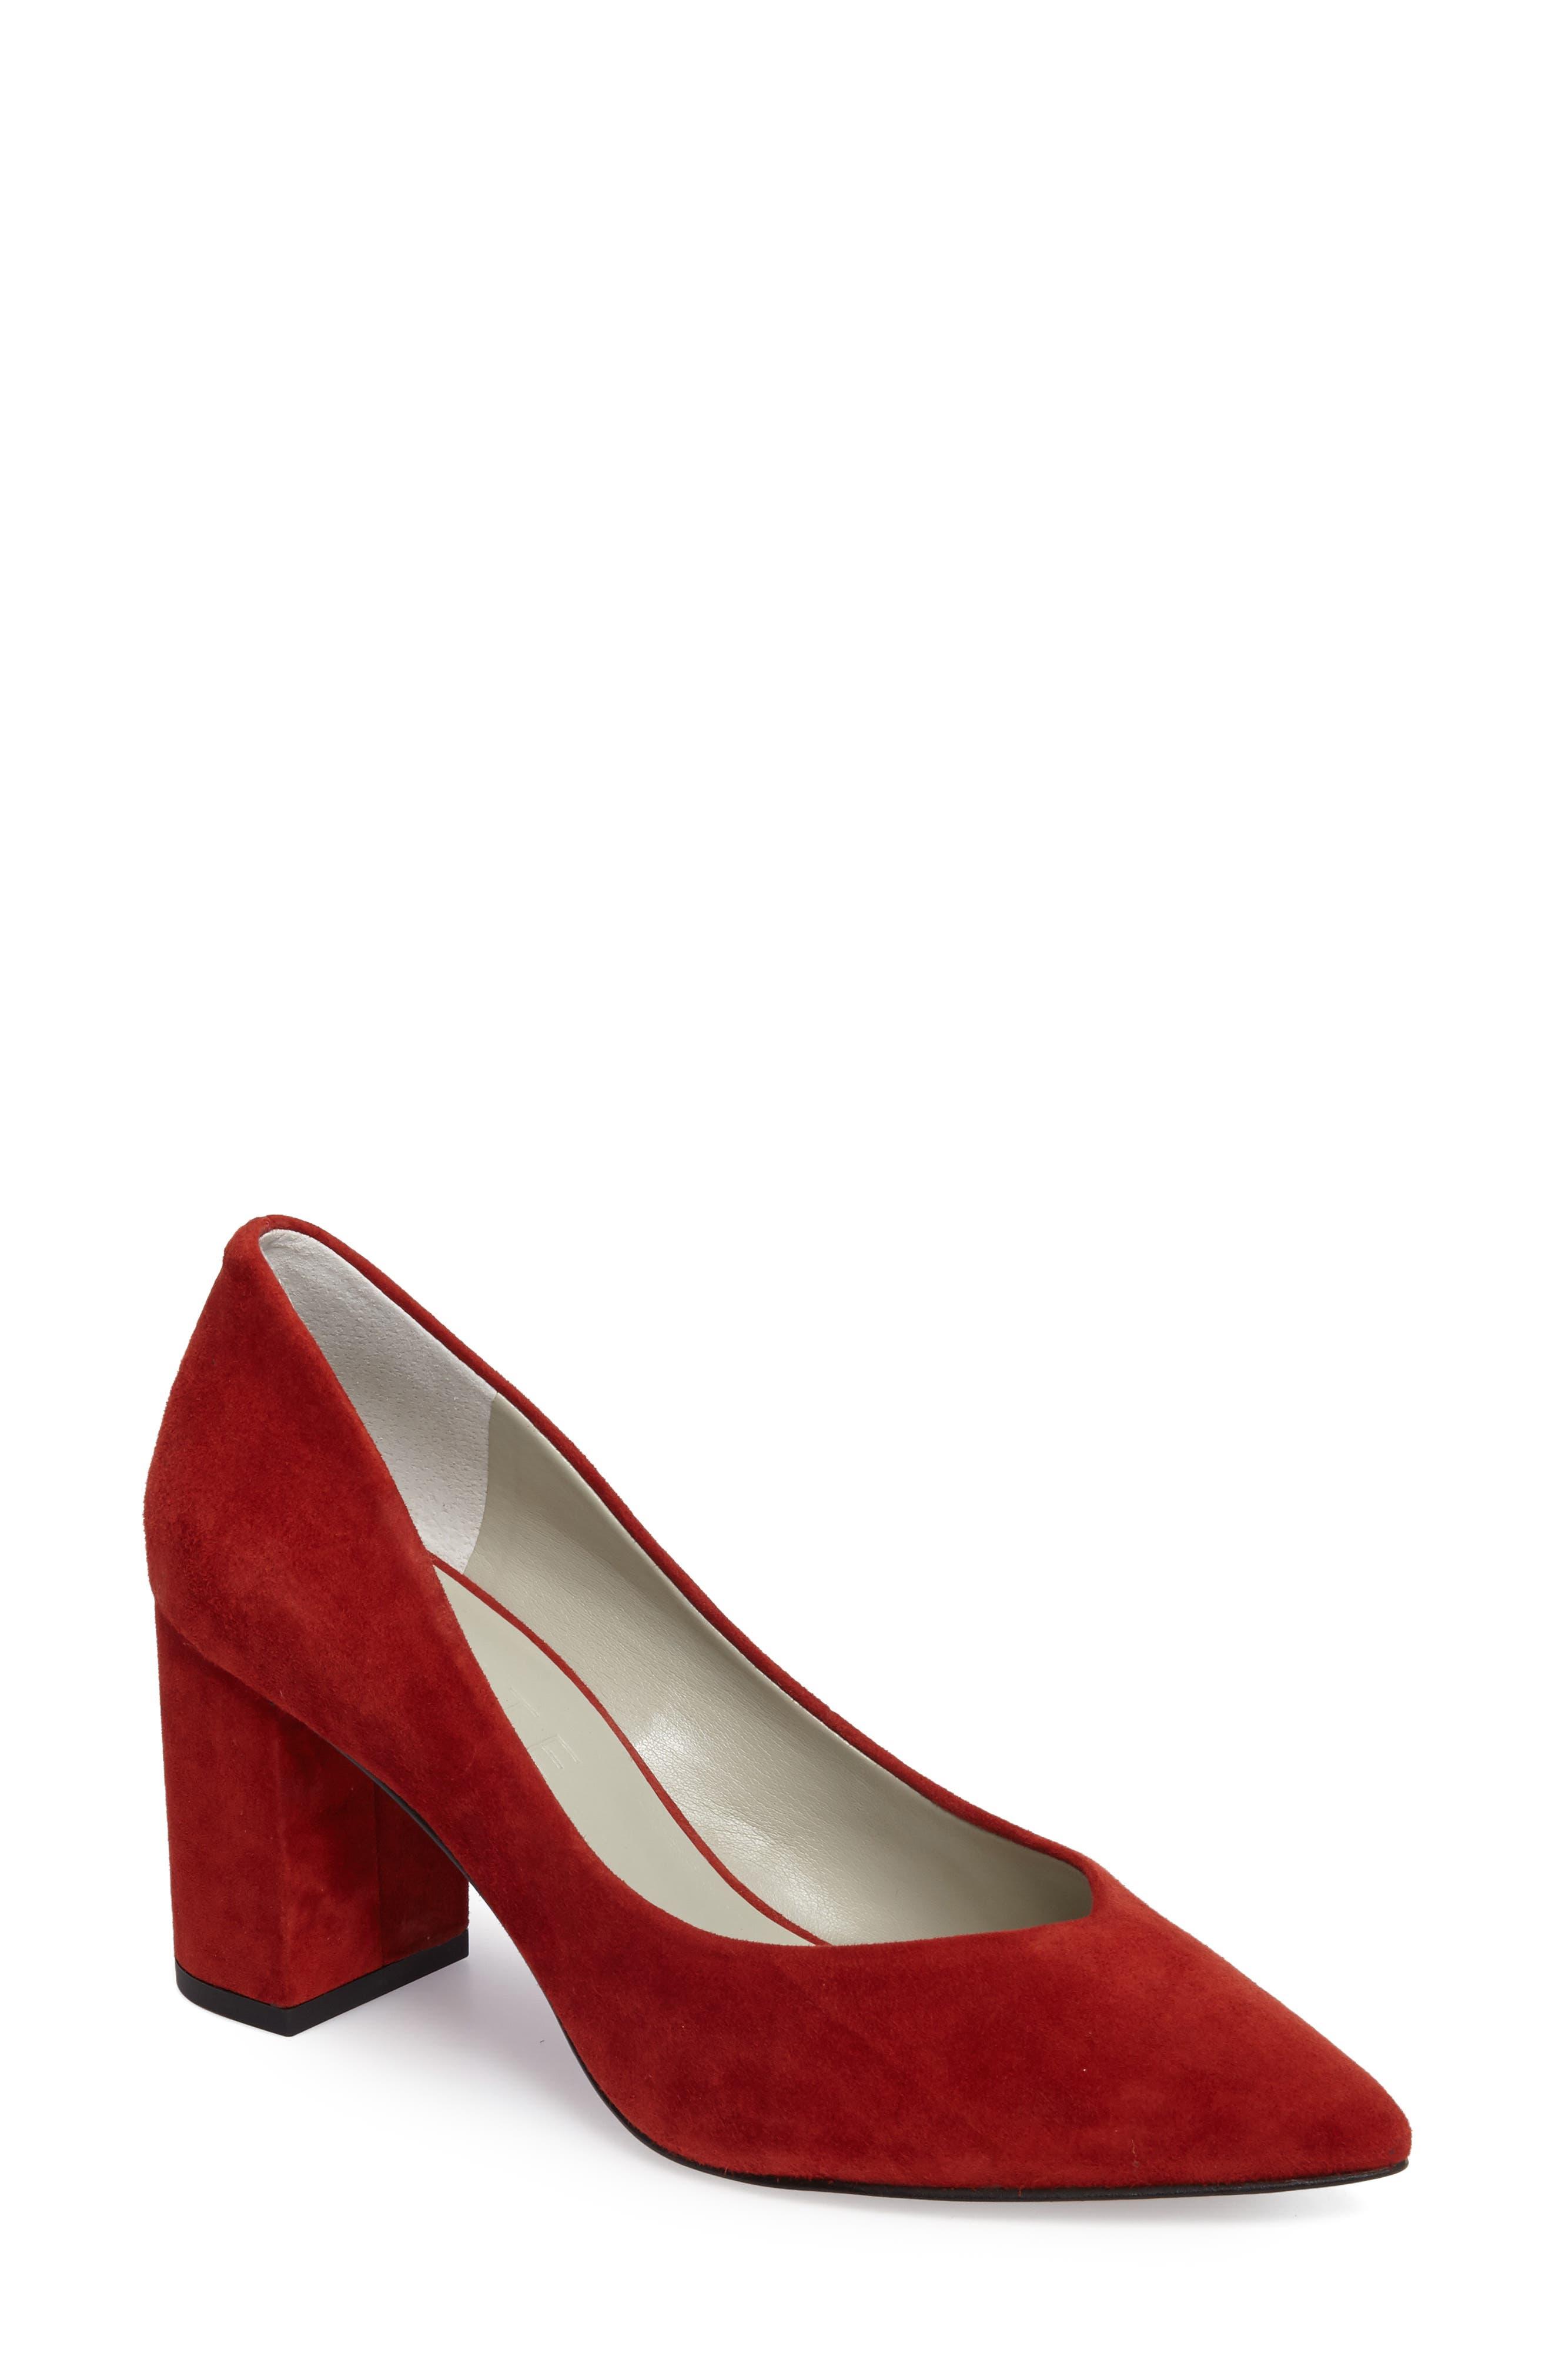 1state saffy block heel pump women